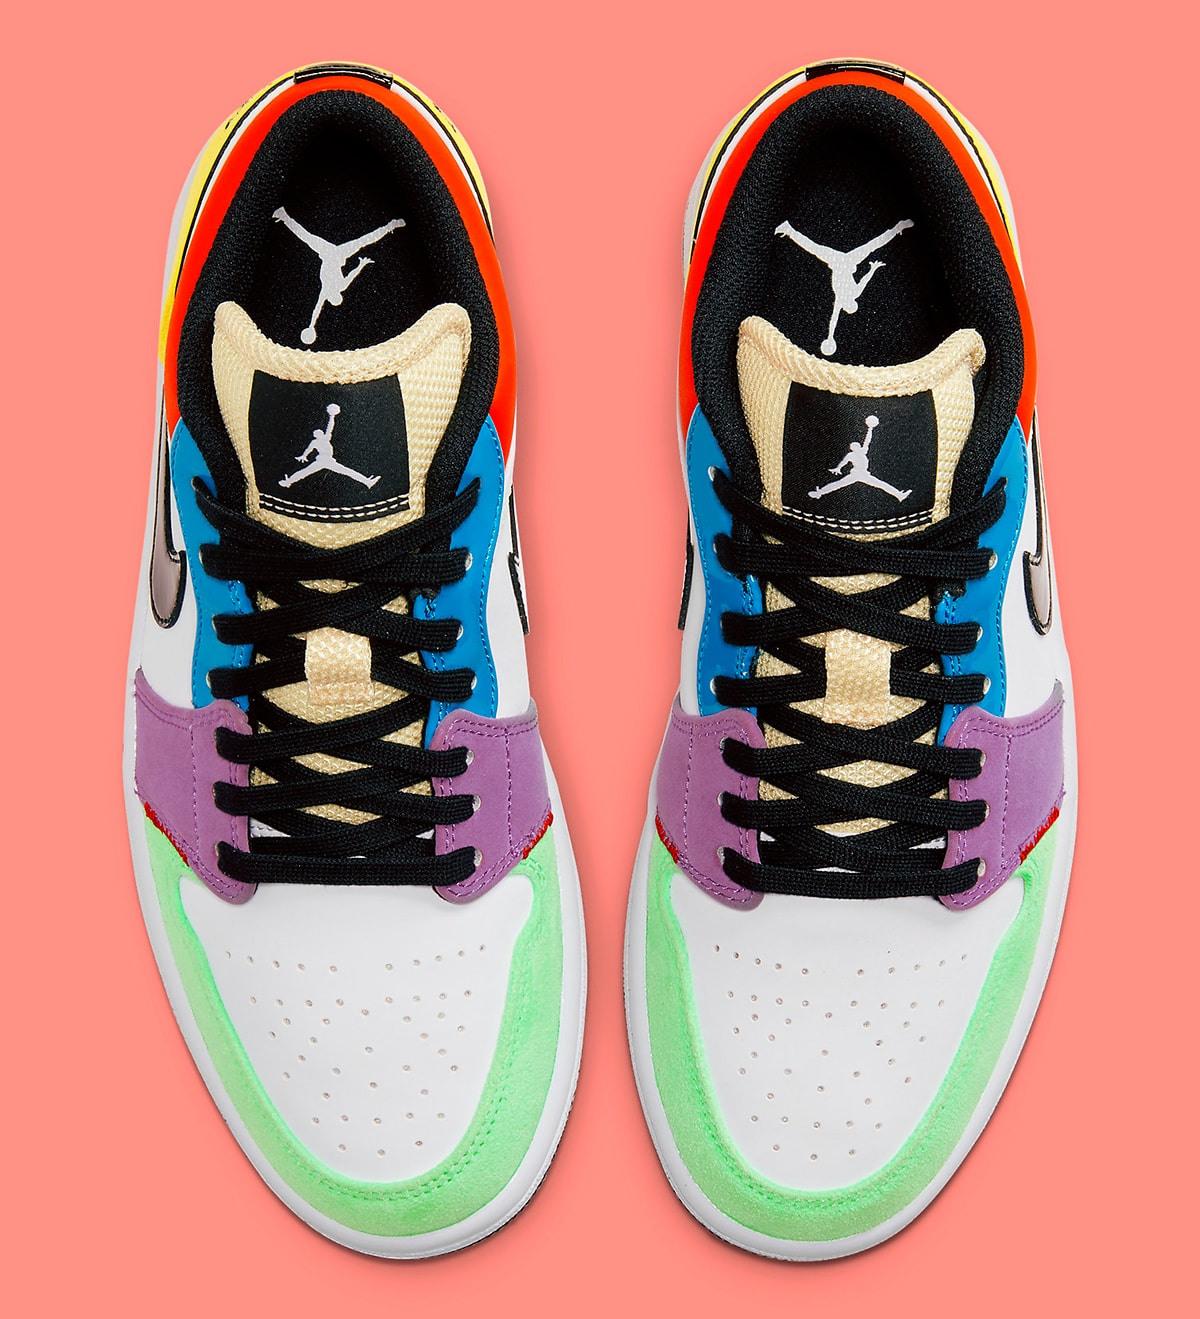 Air Jordan 1 Low Lightbulb